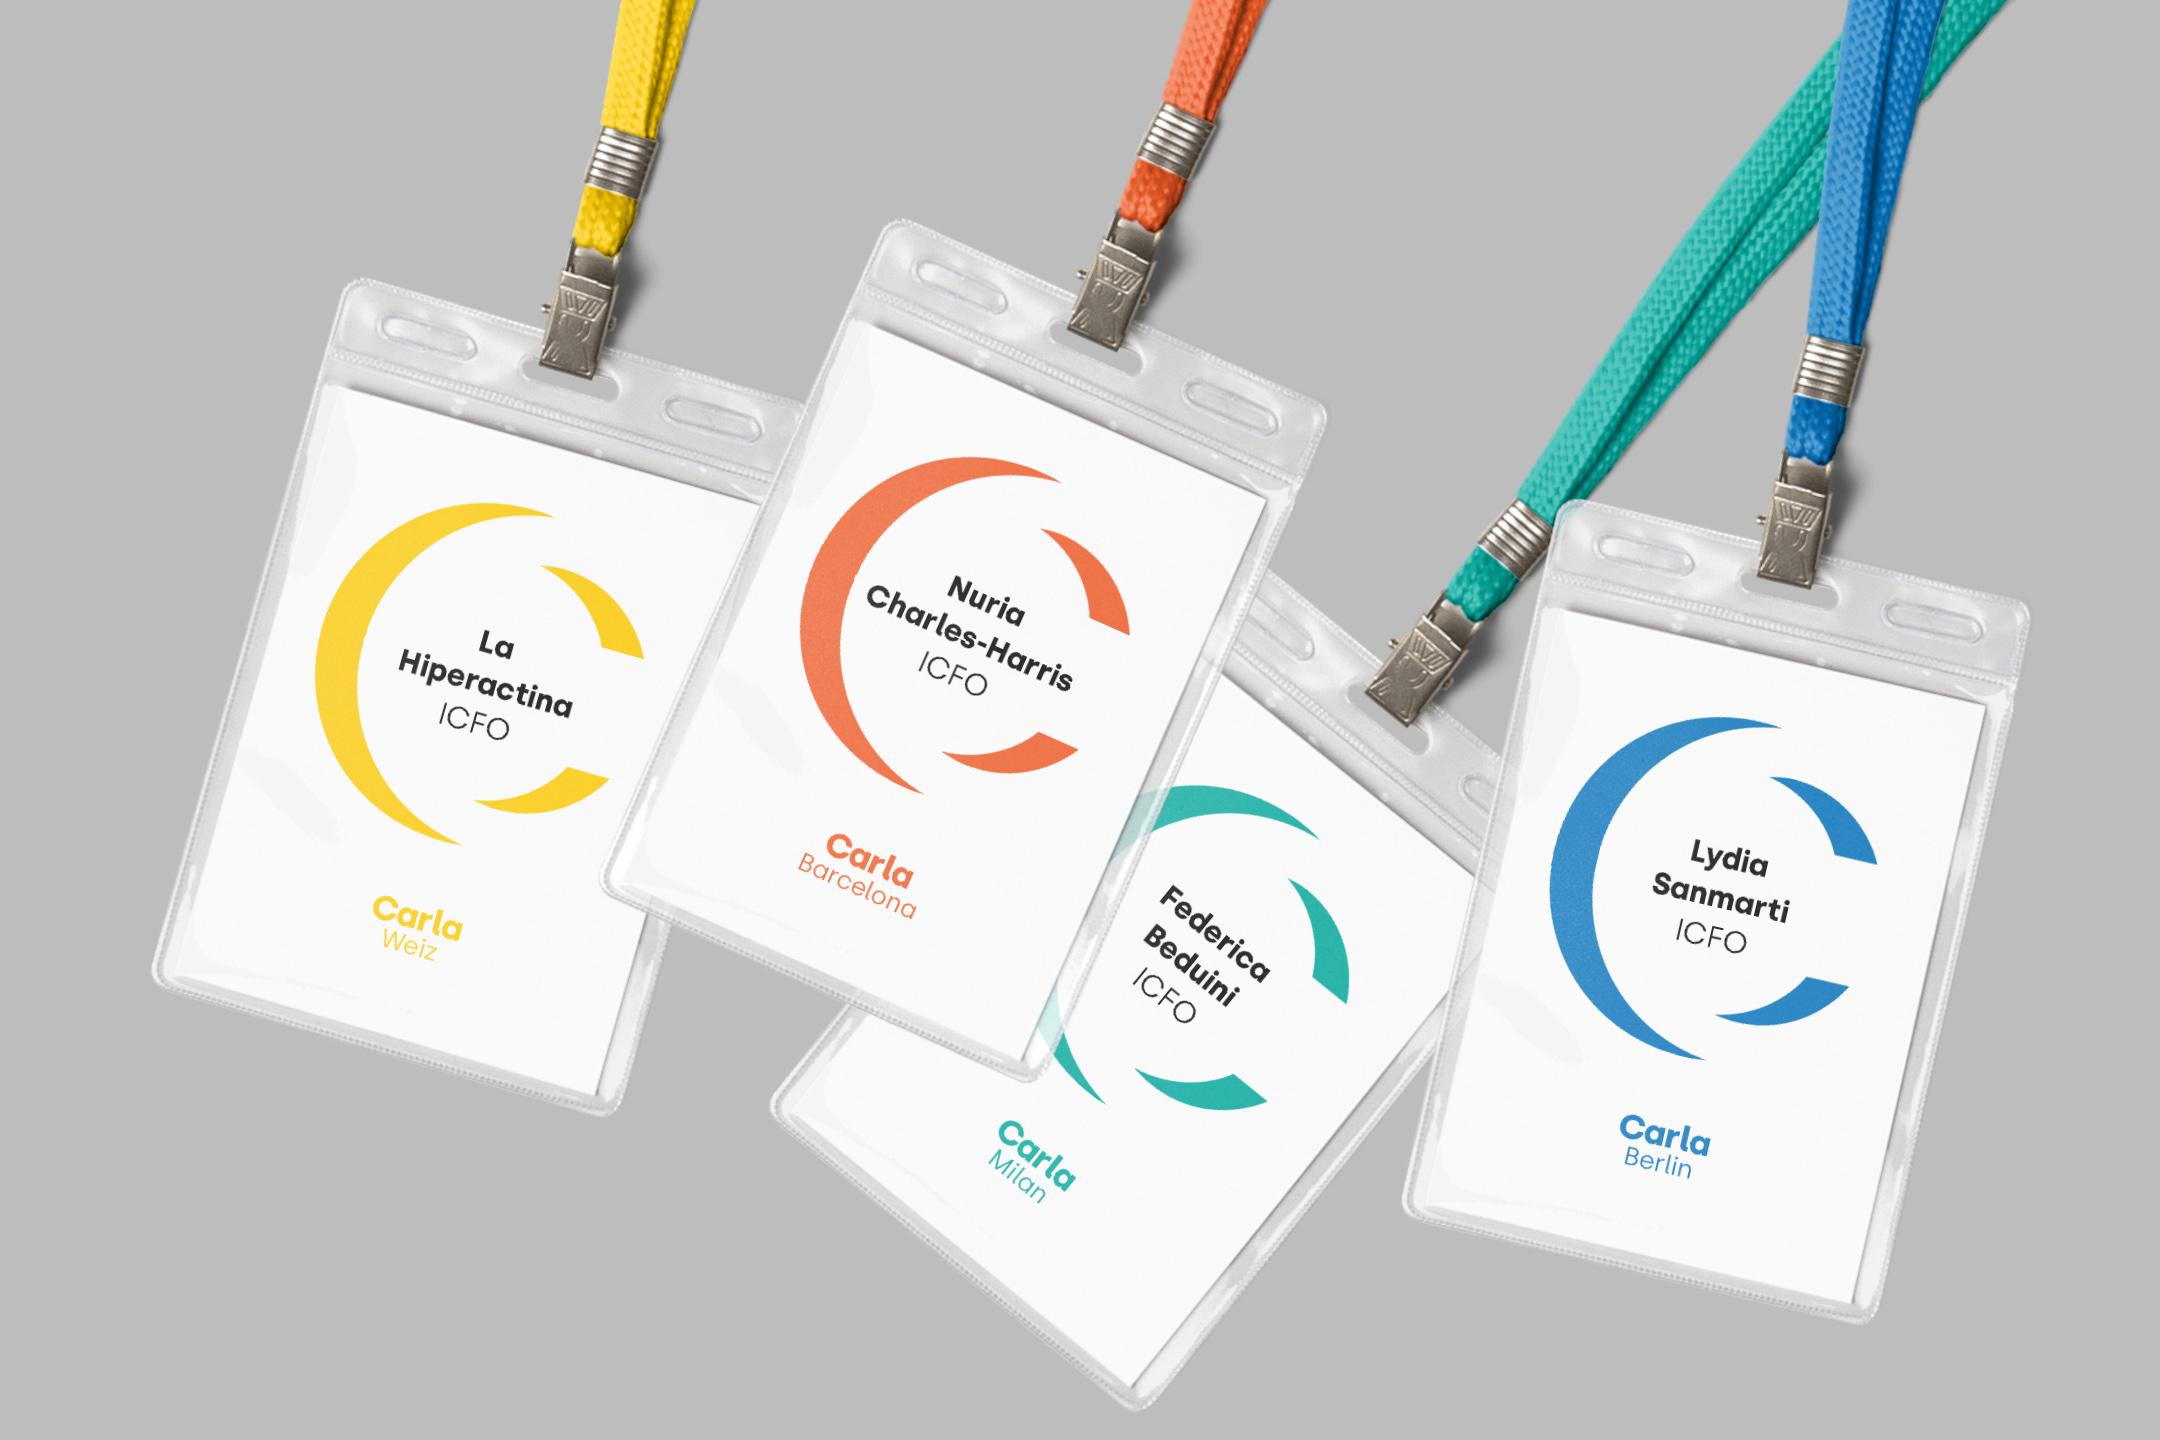 Bitflow-studio-carla-conference-badge-design